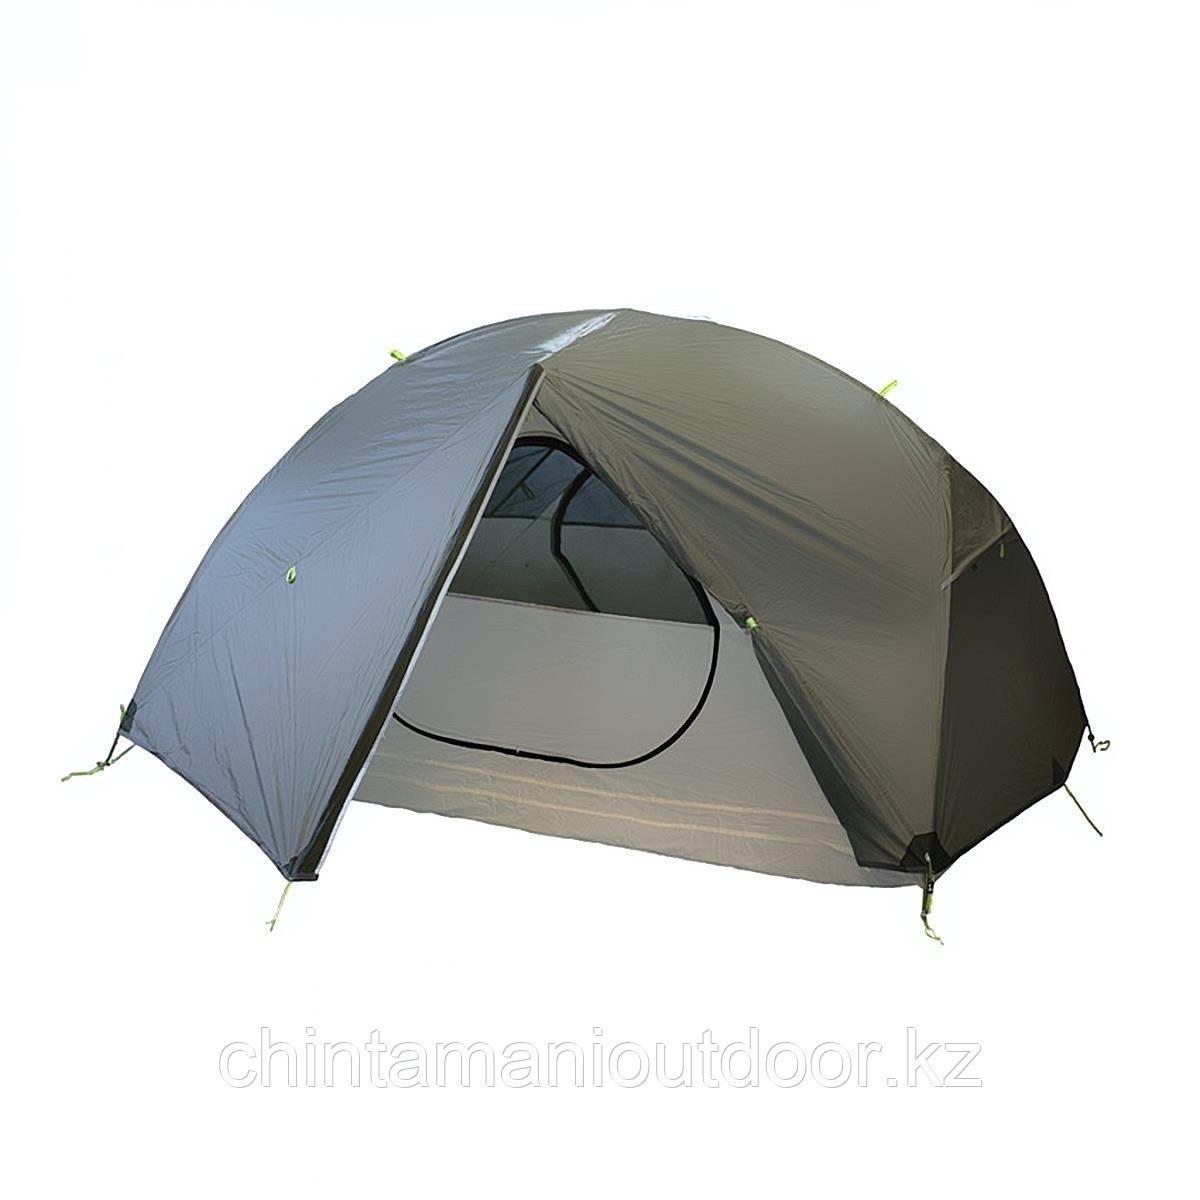 Ультралегкая палатка 2х местная, Tramp Сloud 2 Si, вес 2,15 кг, тамбур - фото 1